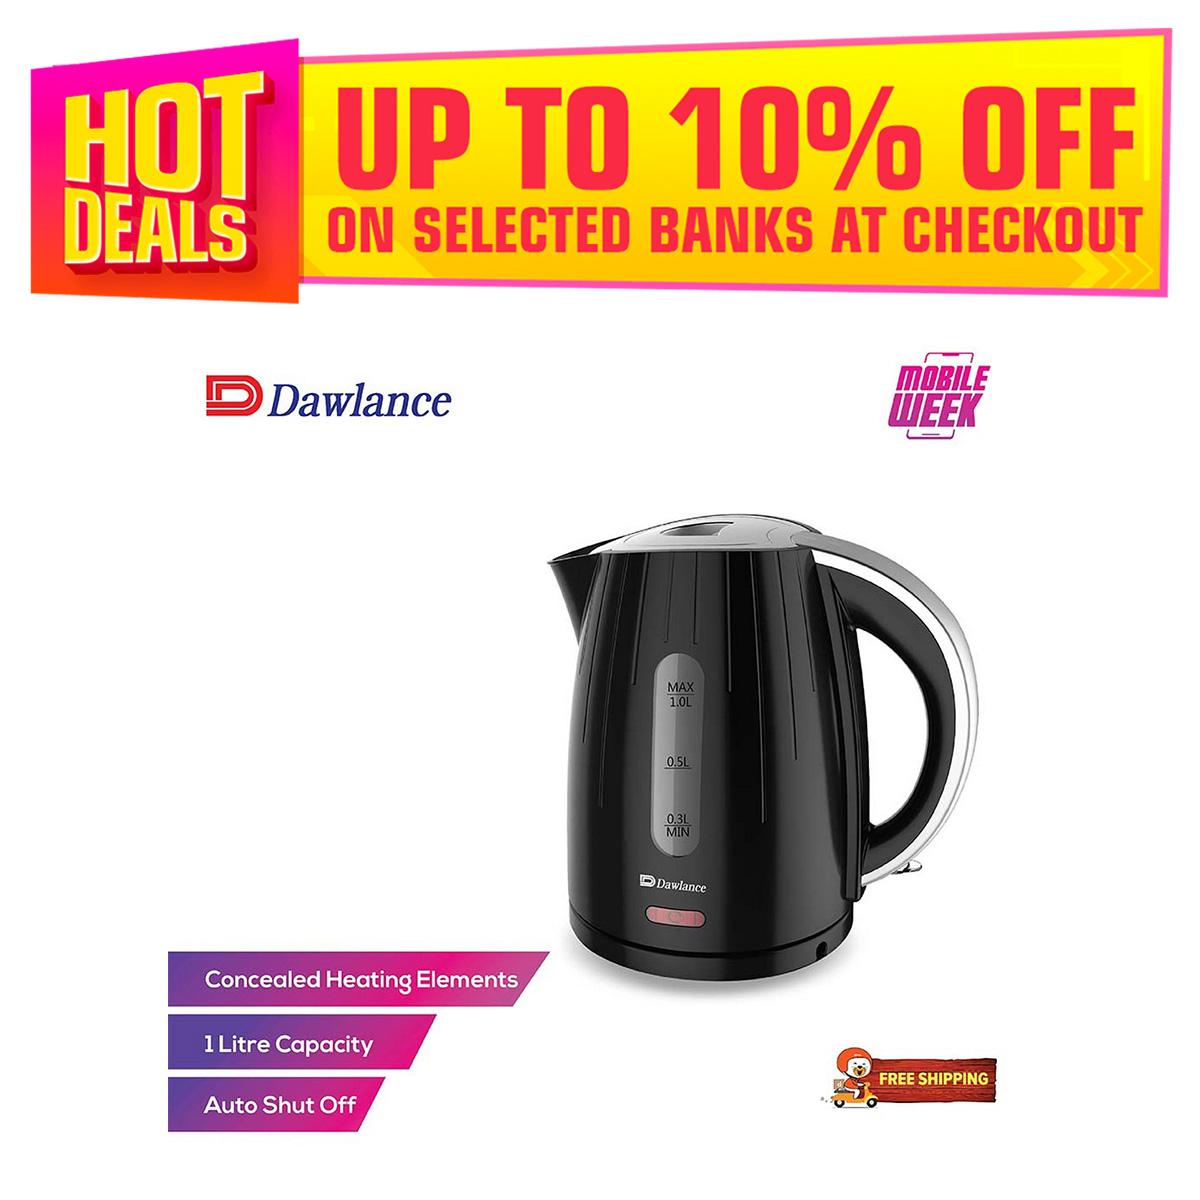 Dawlance Electric Kettle DWEK 7100 Black 2 1 Liter